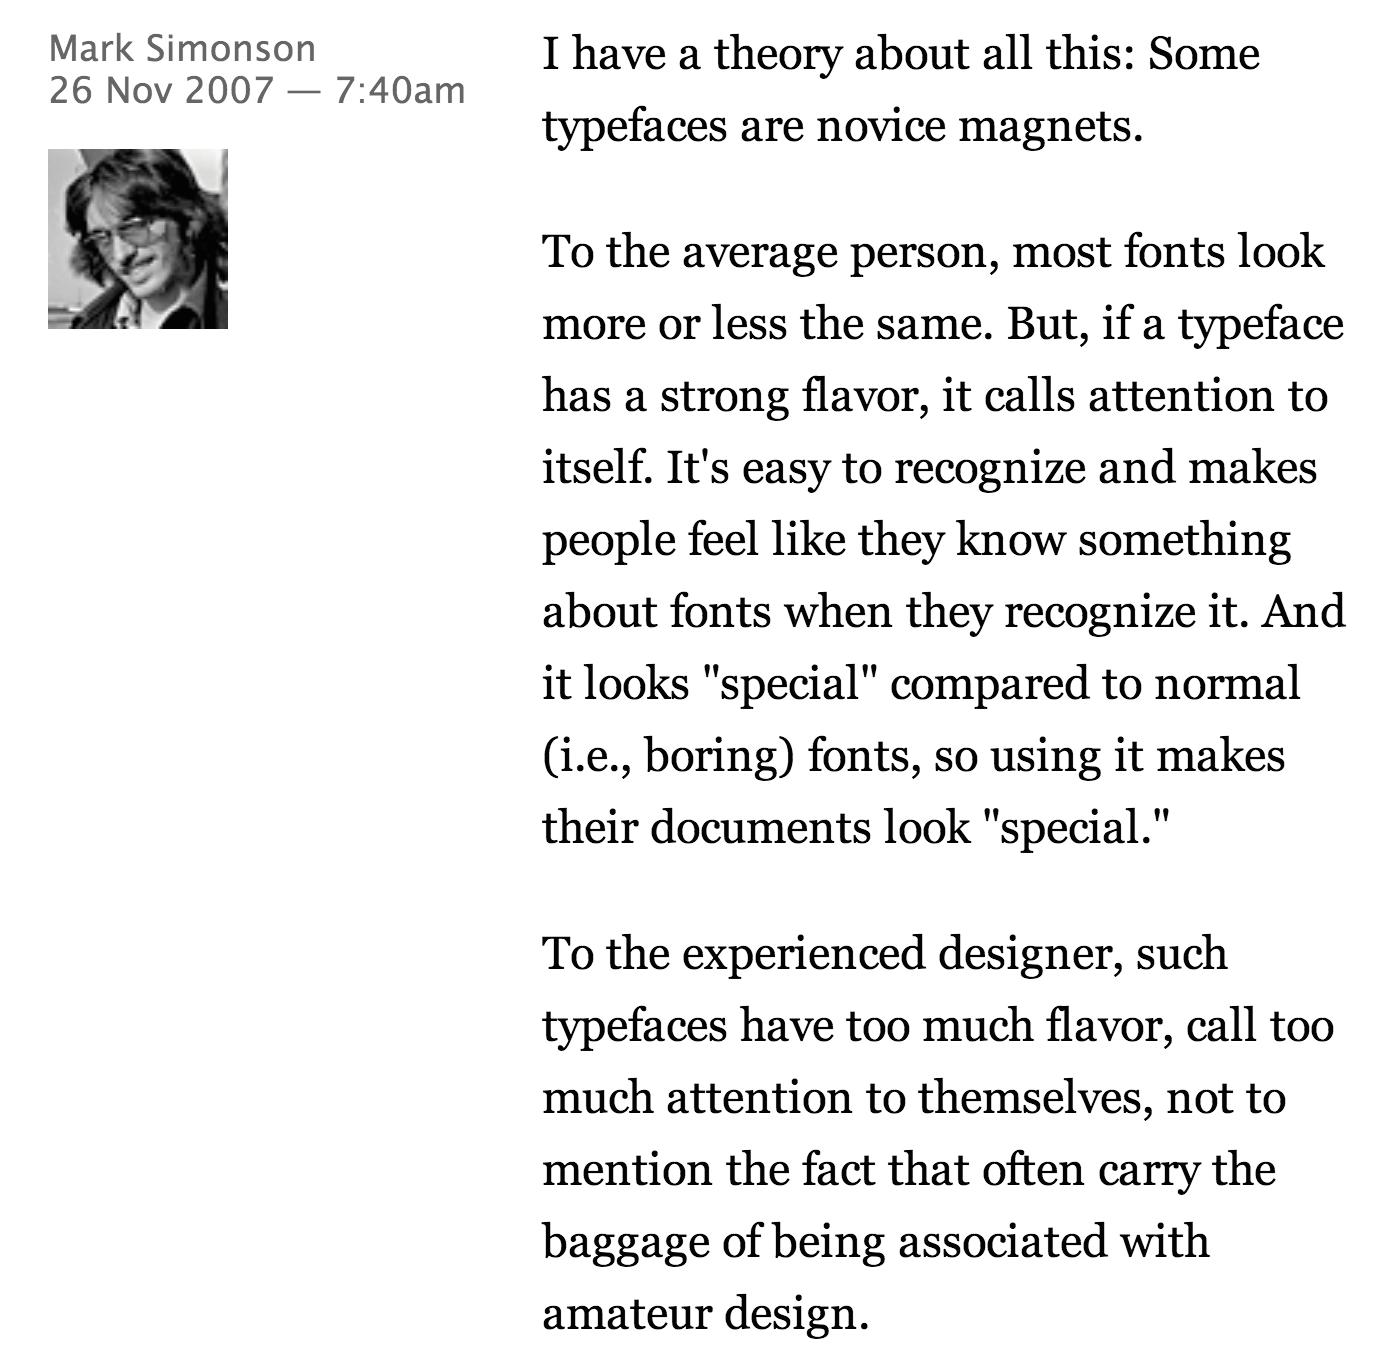 novice magnets Mark Simonson